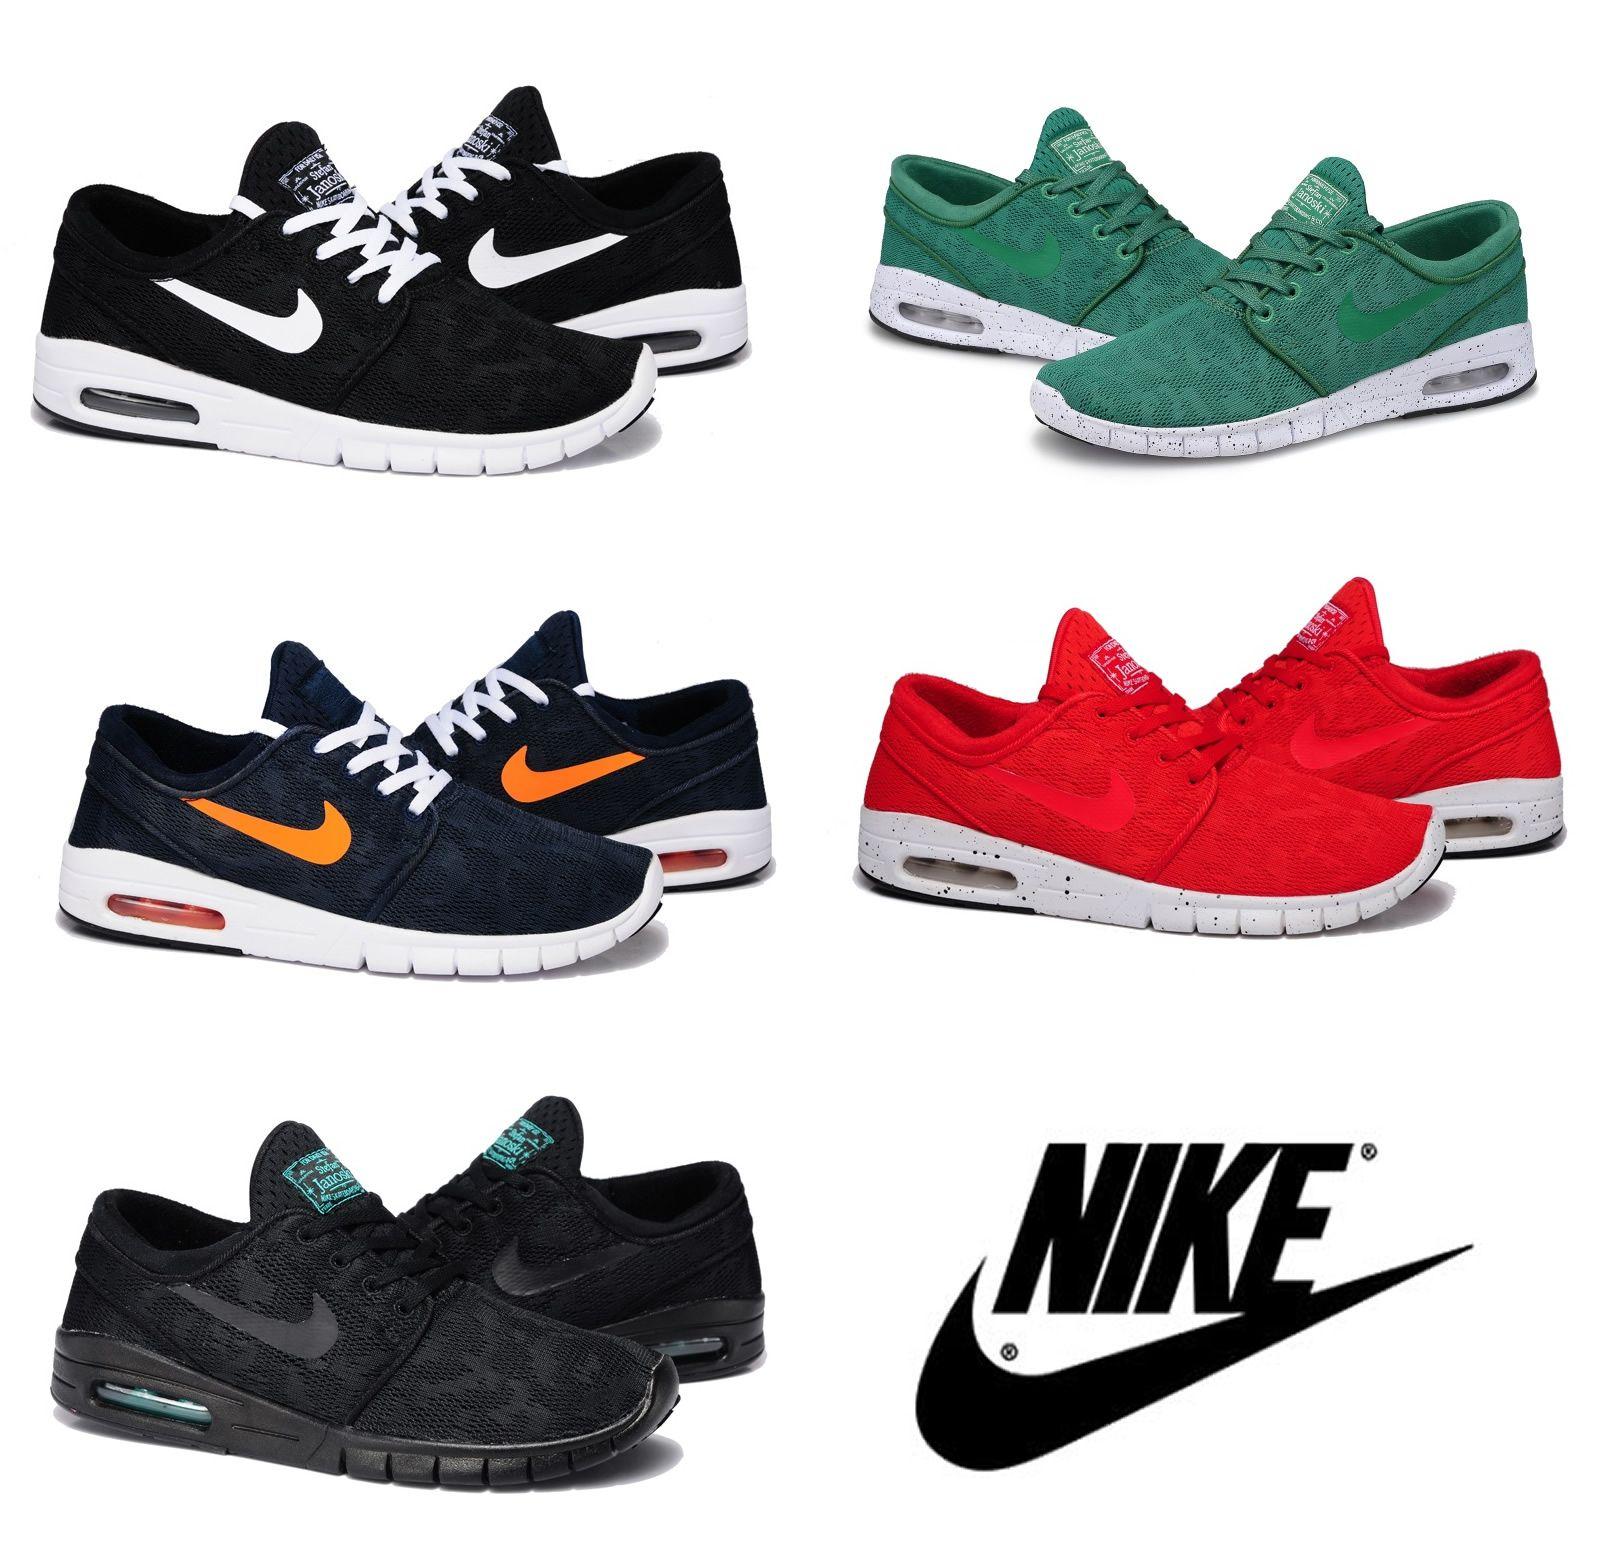 Nike Janoski Shoes Cheap